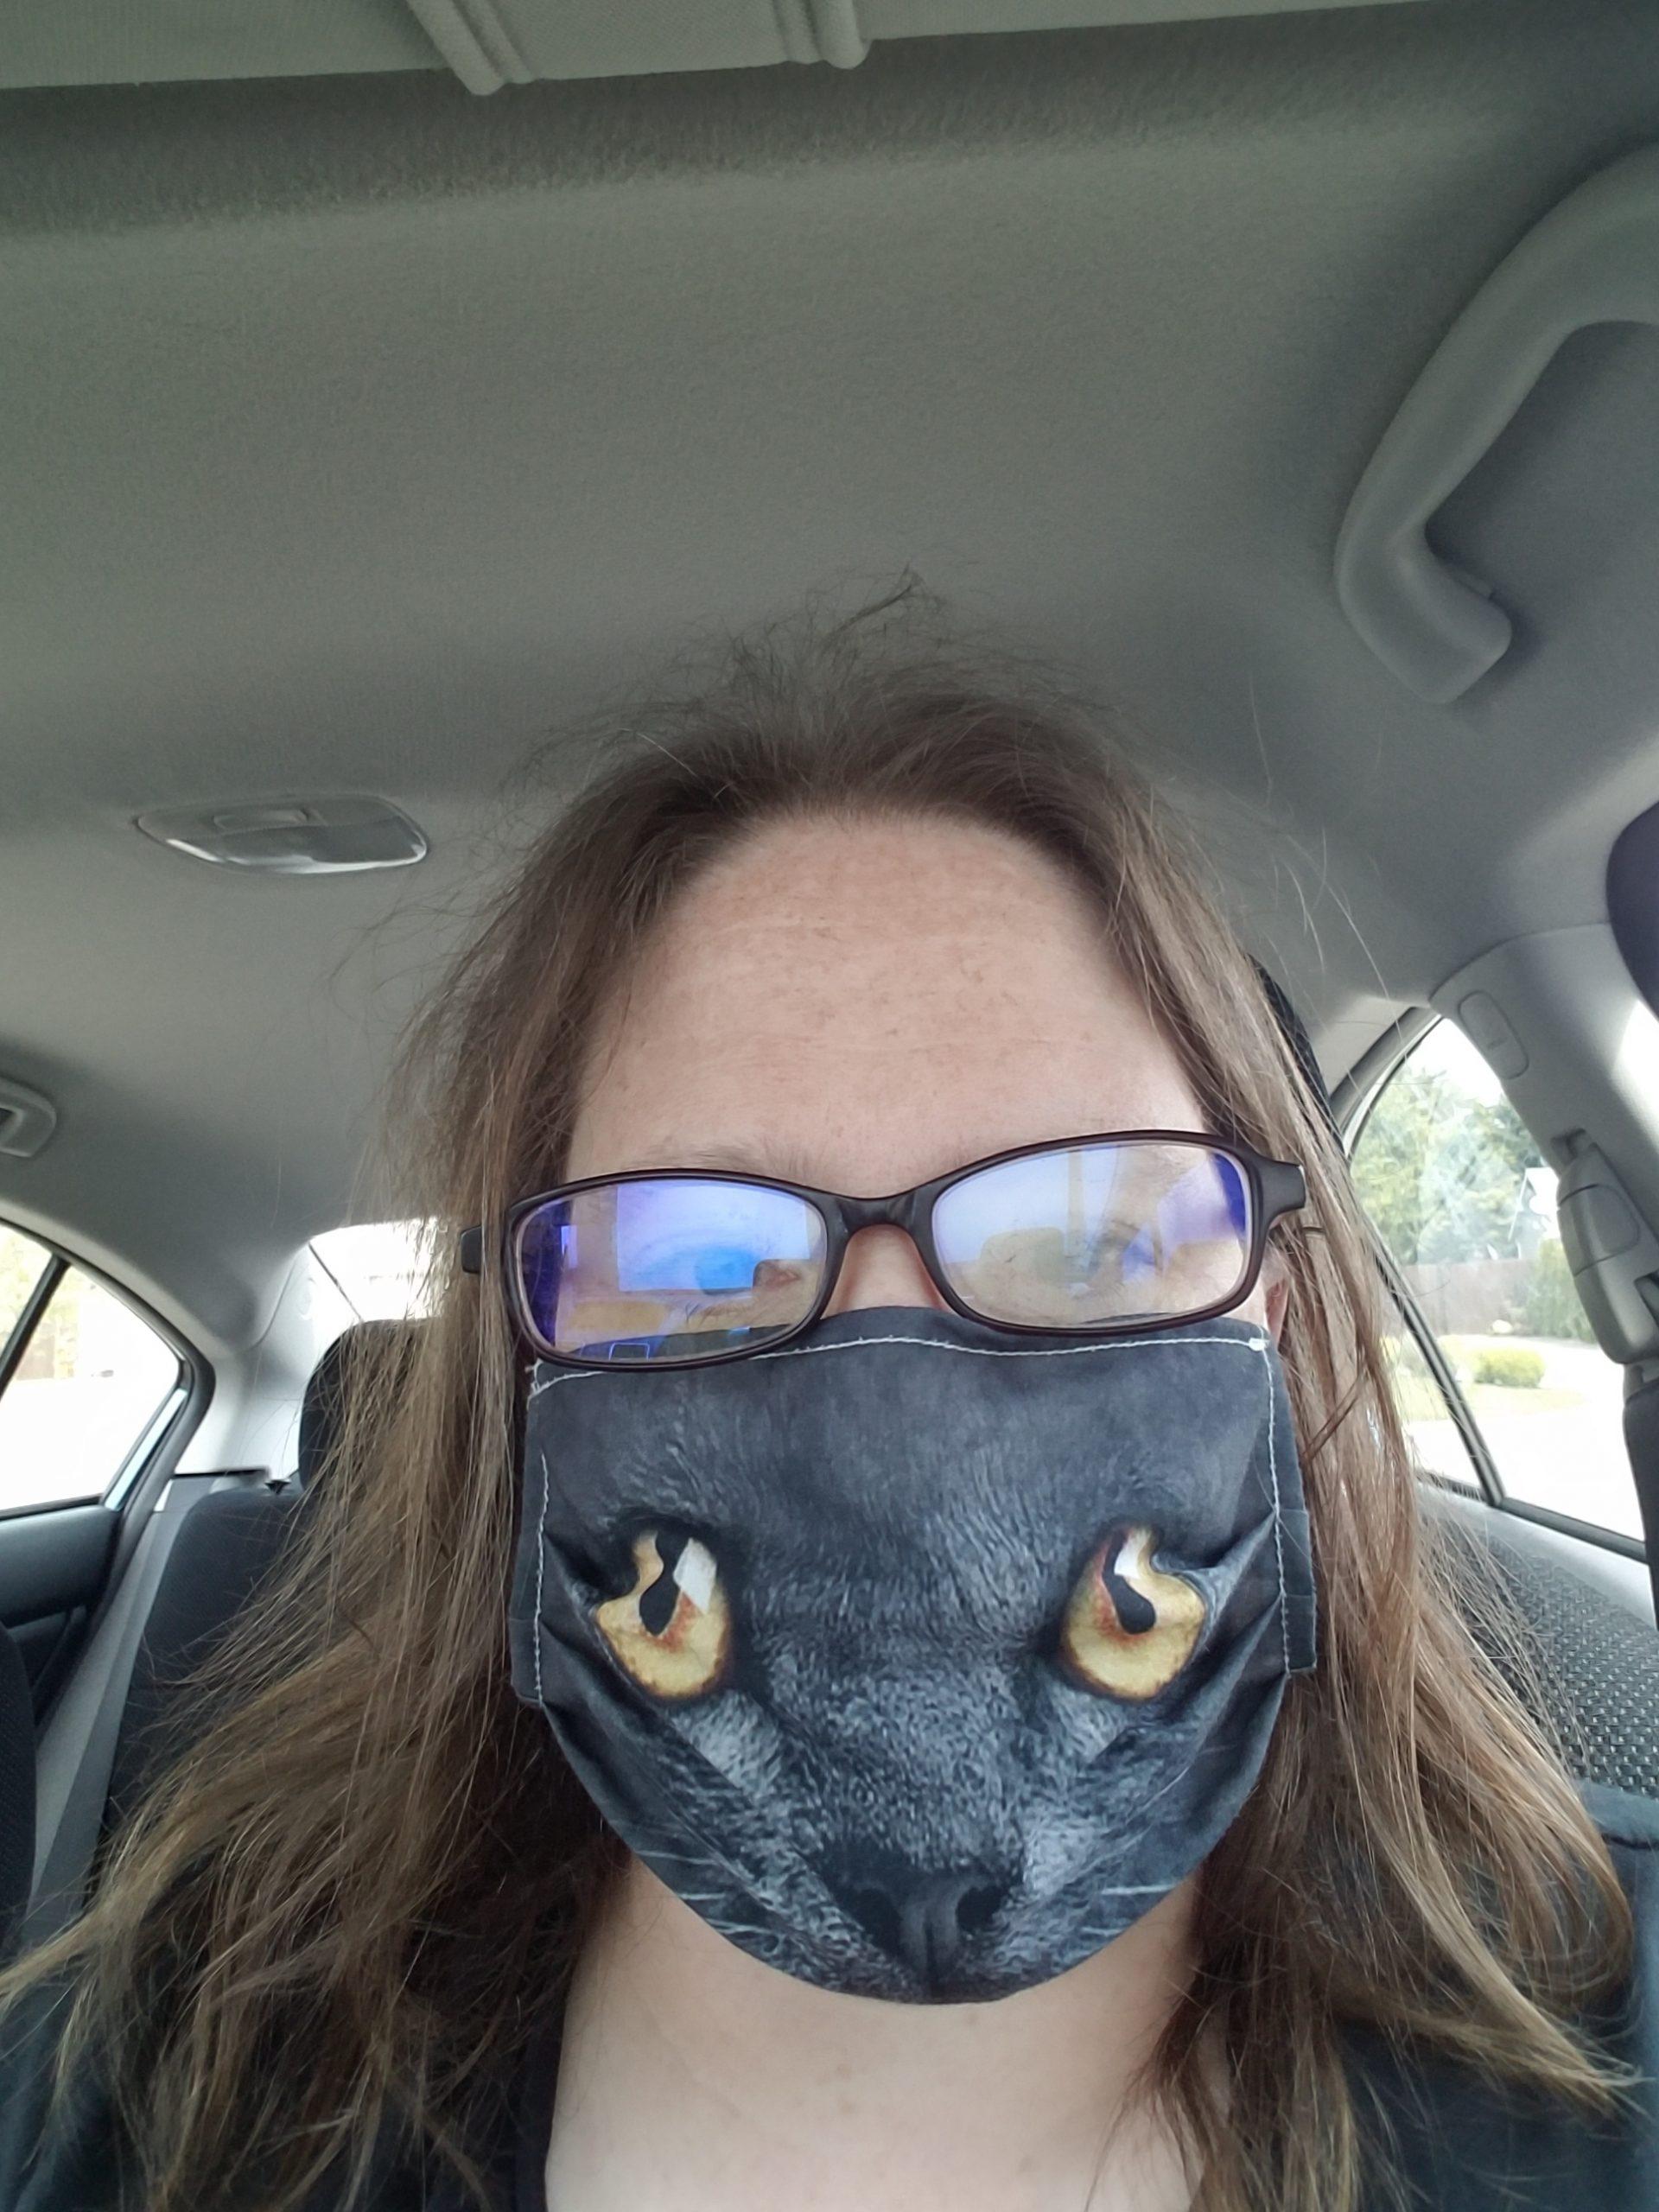 Kitty mask selfie!